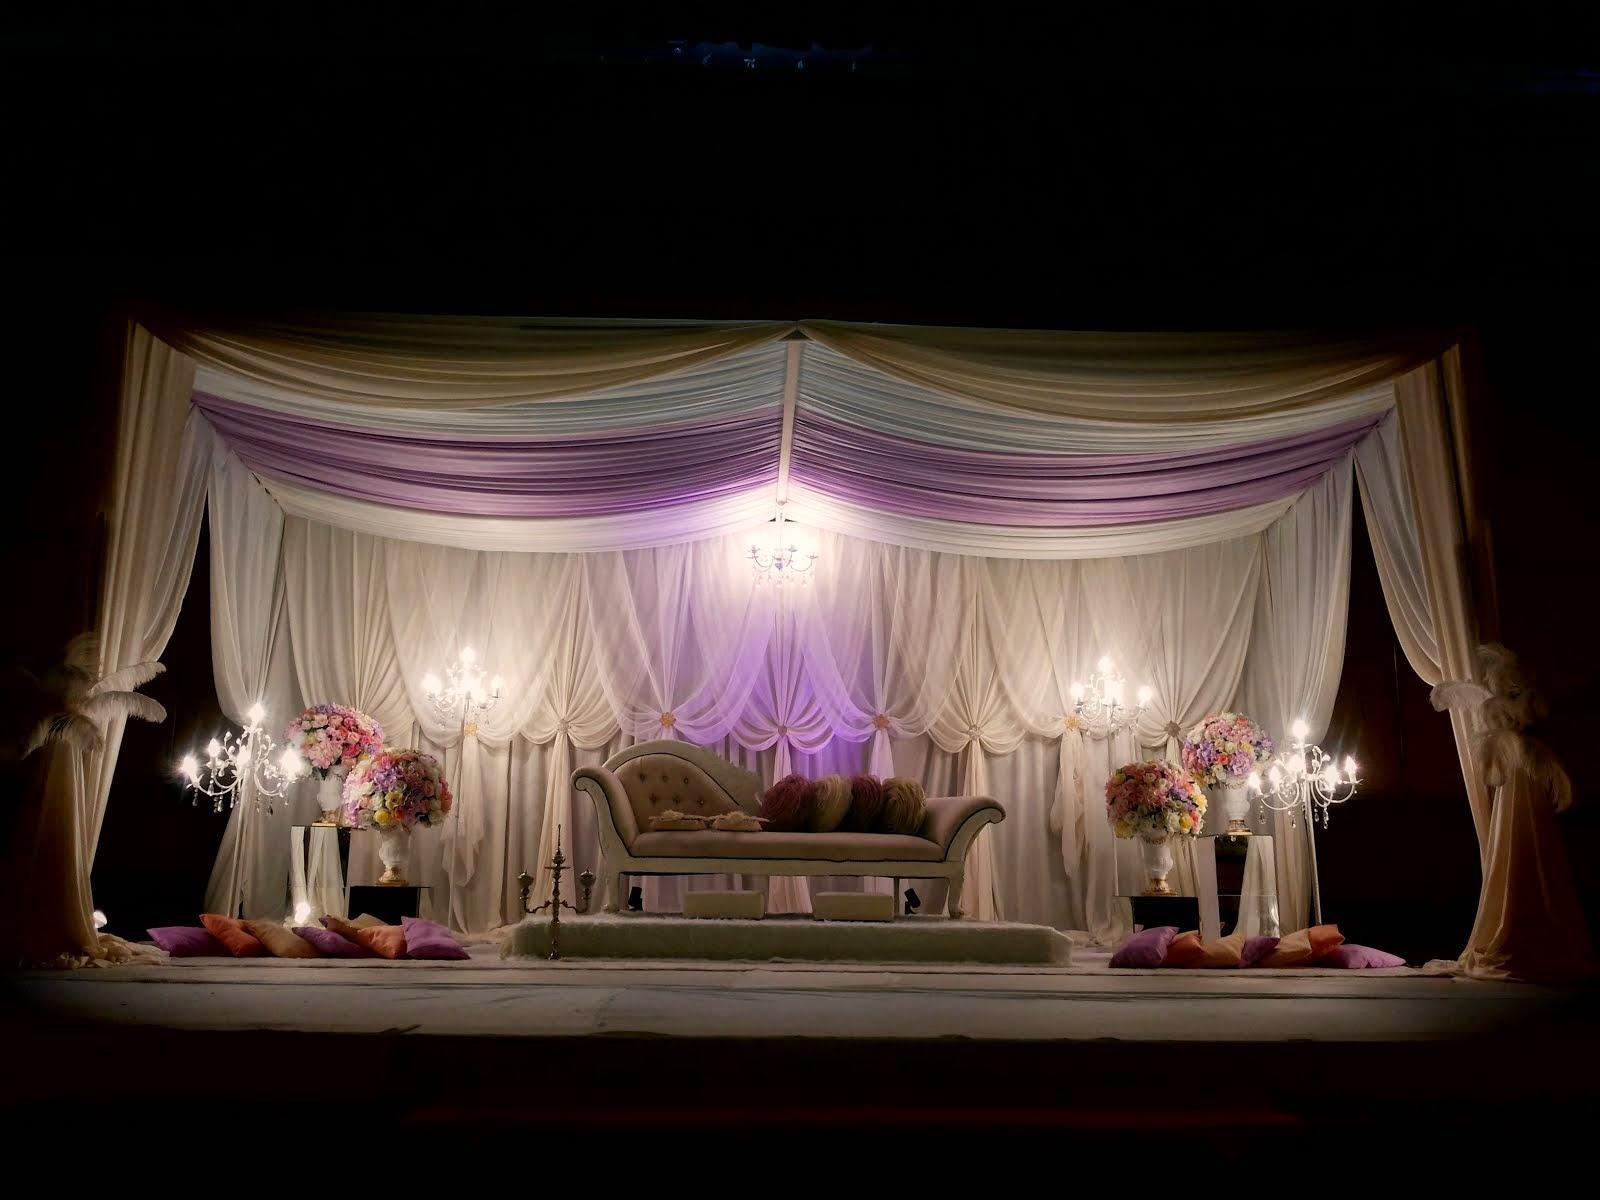 Pelamin Dewan Tirai,6 flower Stand,red carpet,pintu gerbang  RM2000.00